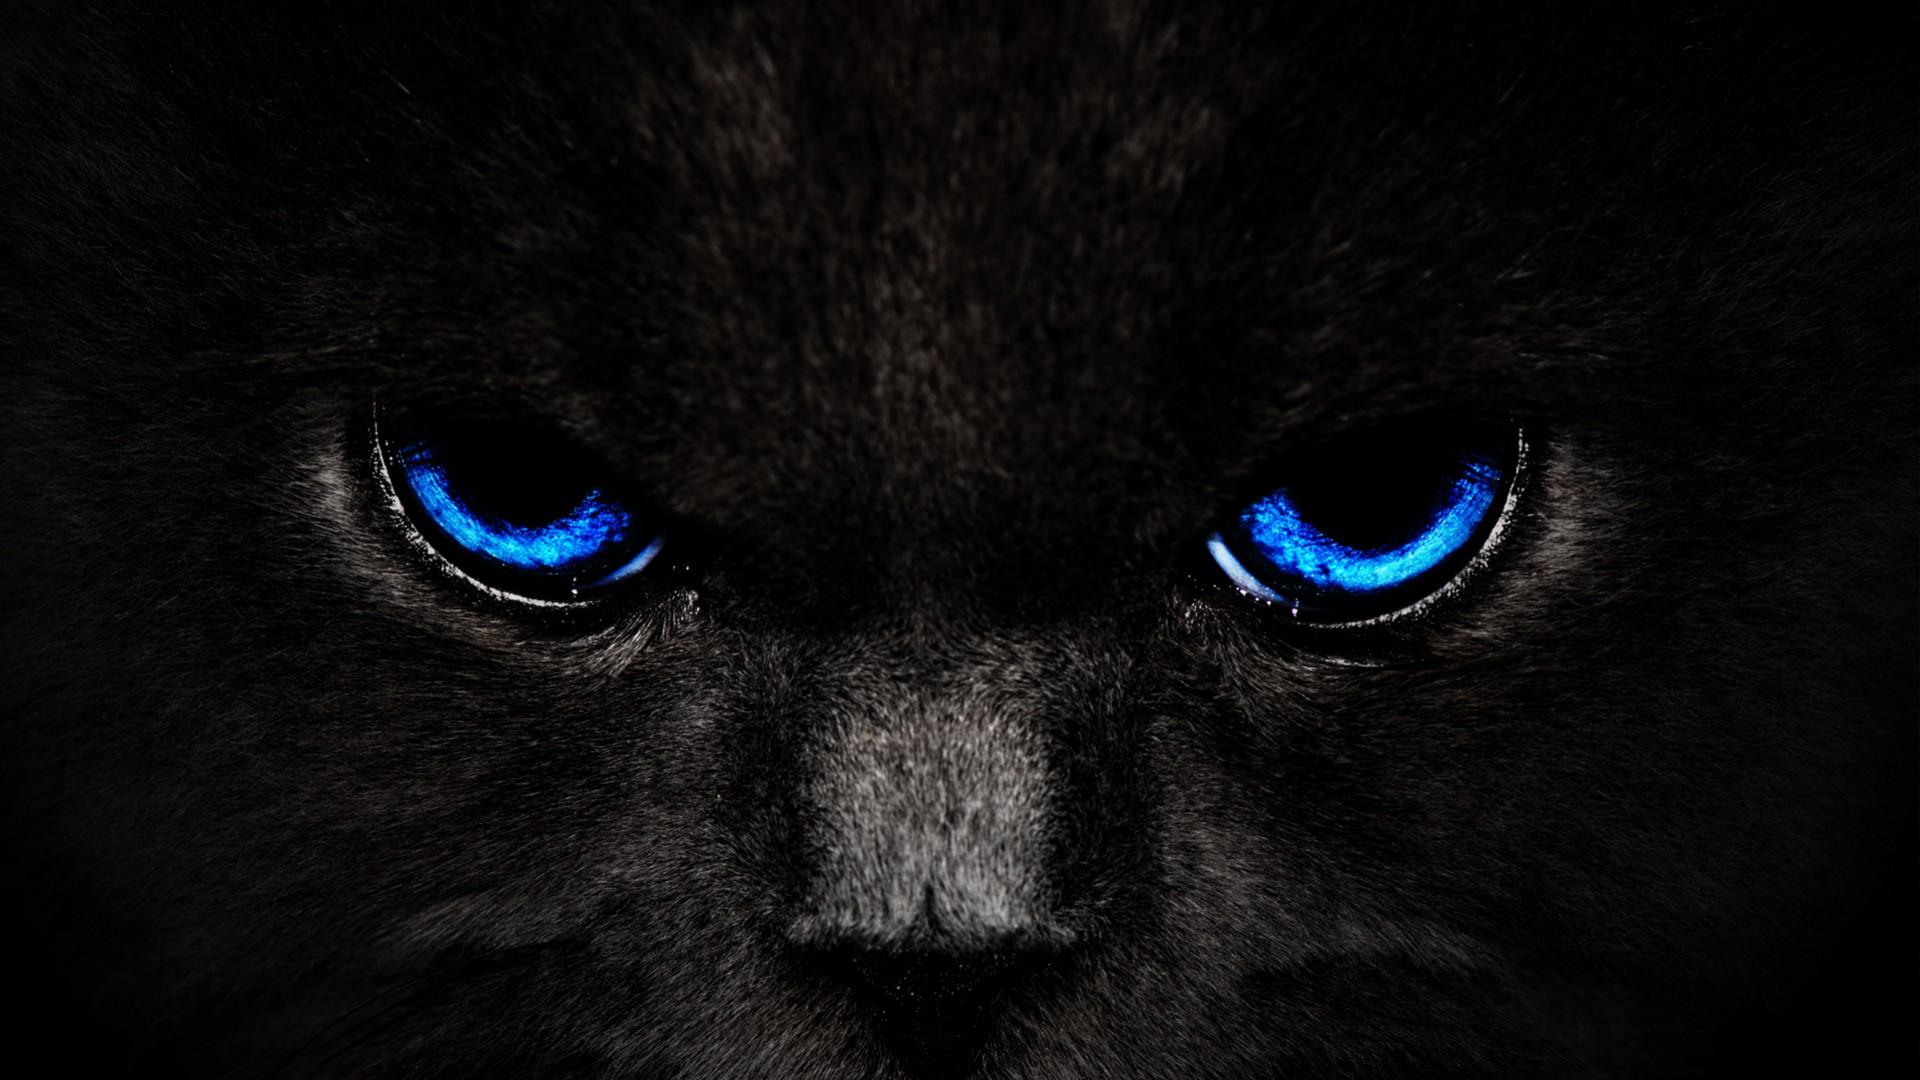 Cat Blue Eyes Desktop Wallpaper pageresourcecom 1920x1080